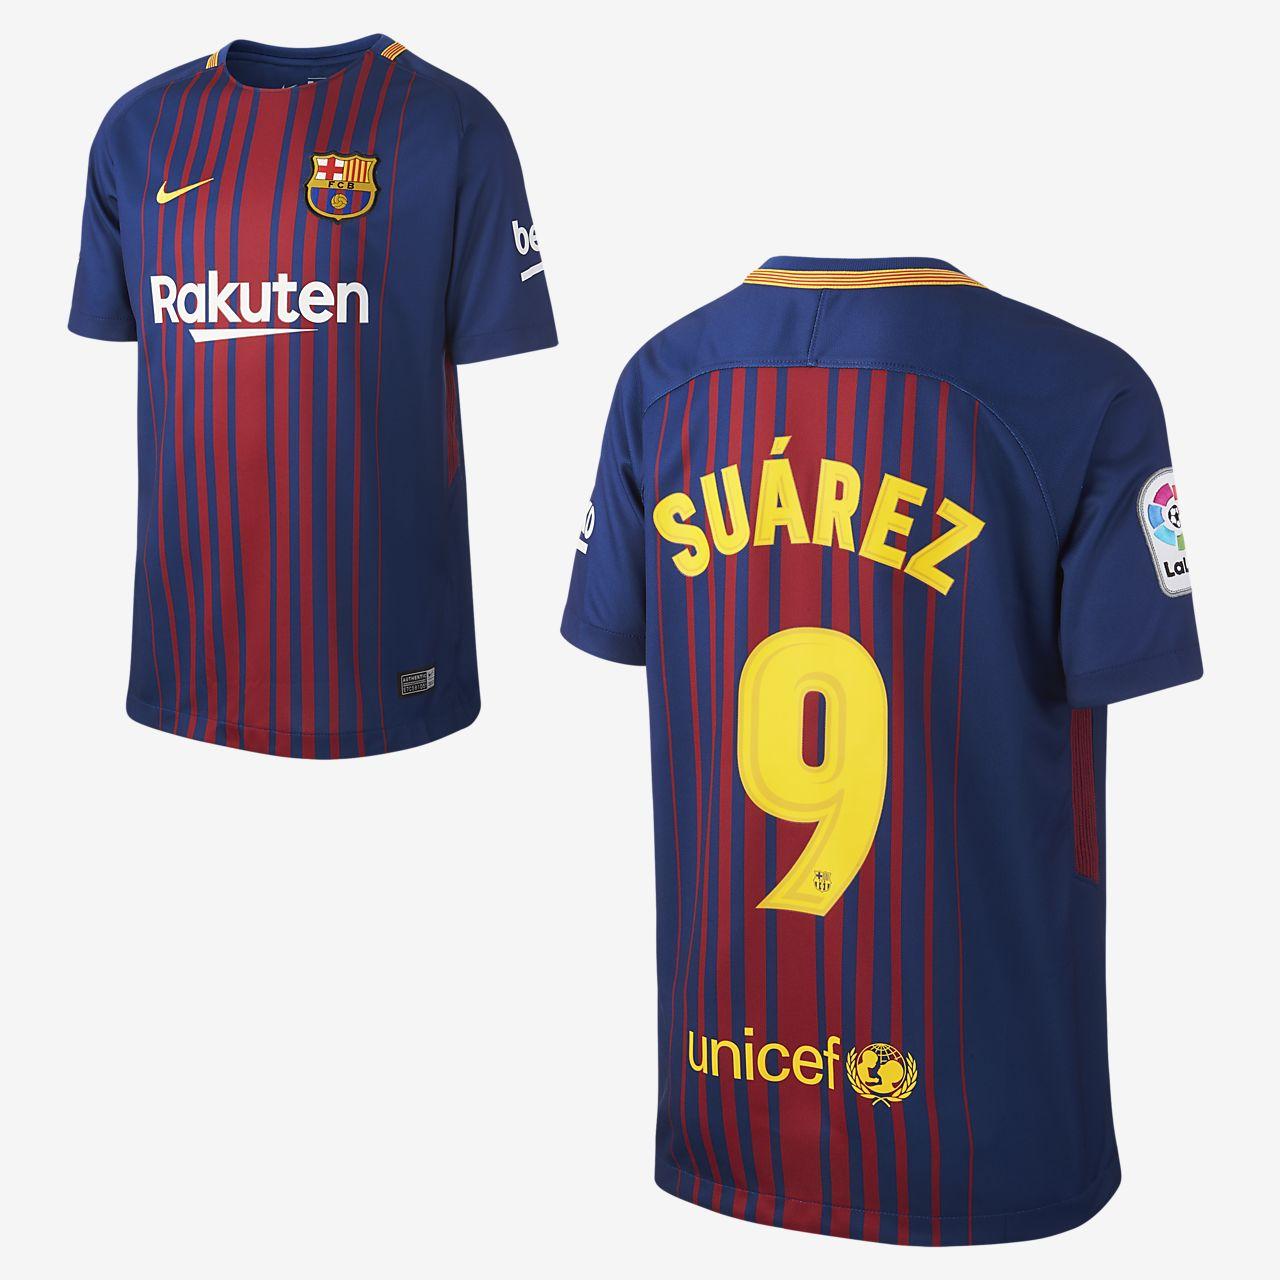 2017/18 FC Barcelona Home (Luis Suárez) Older Kids' Football Shirt